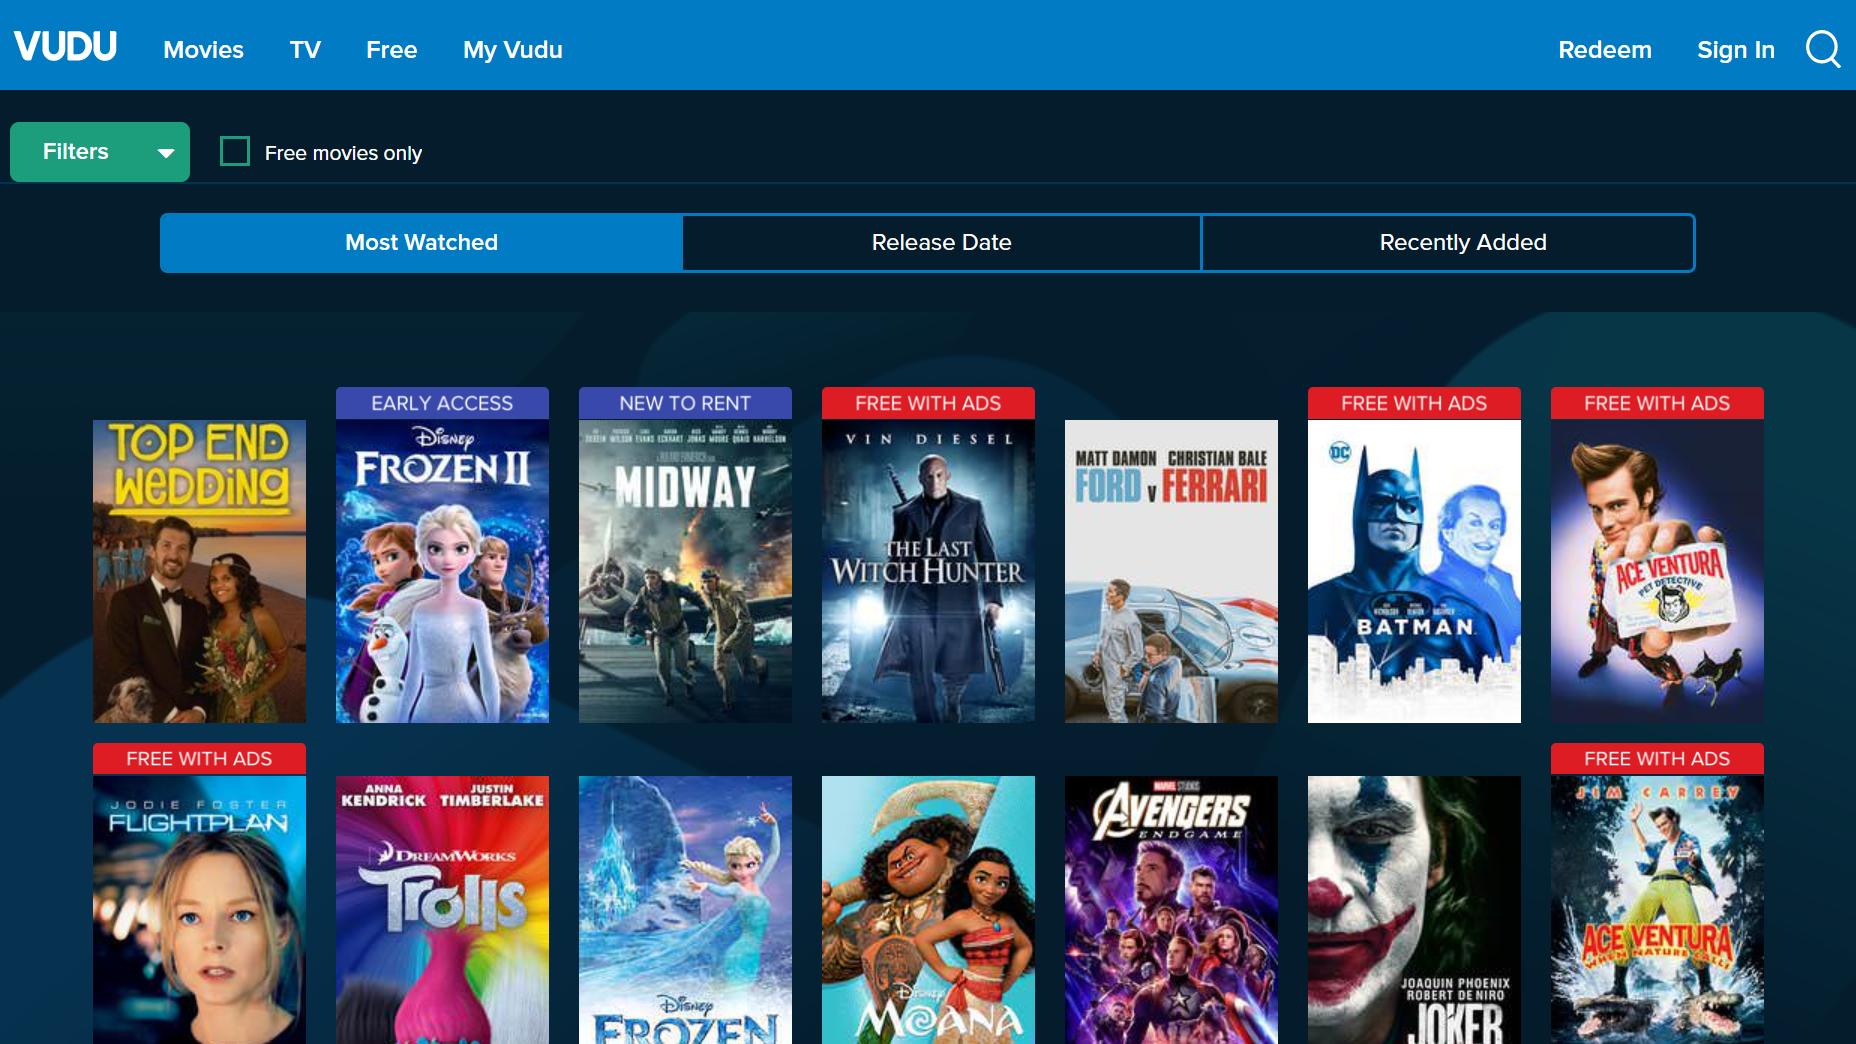 vudu interface free movie apps